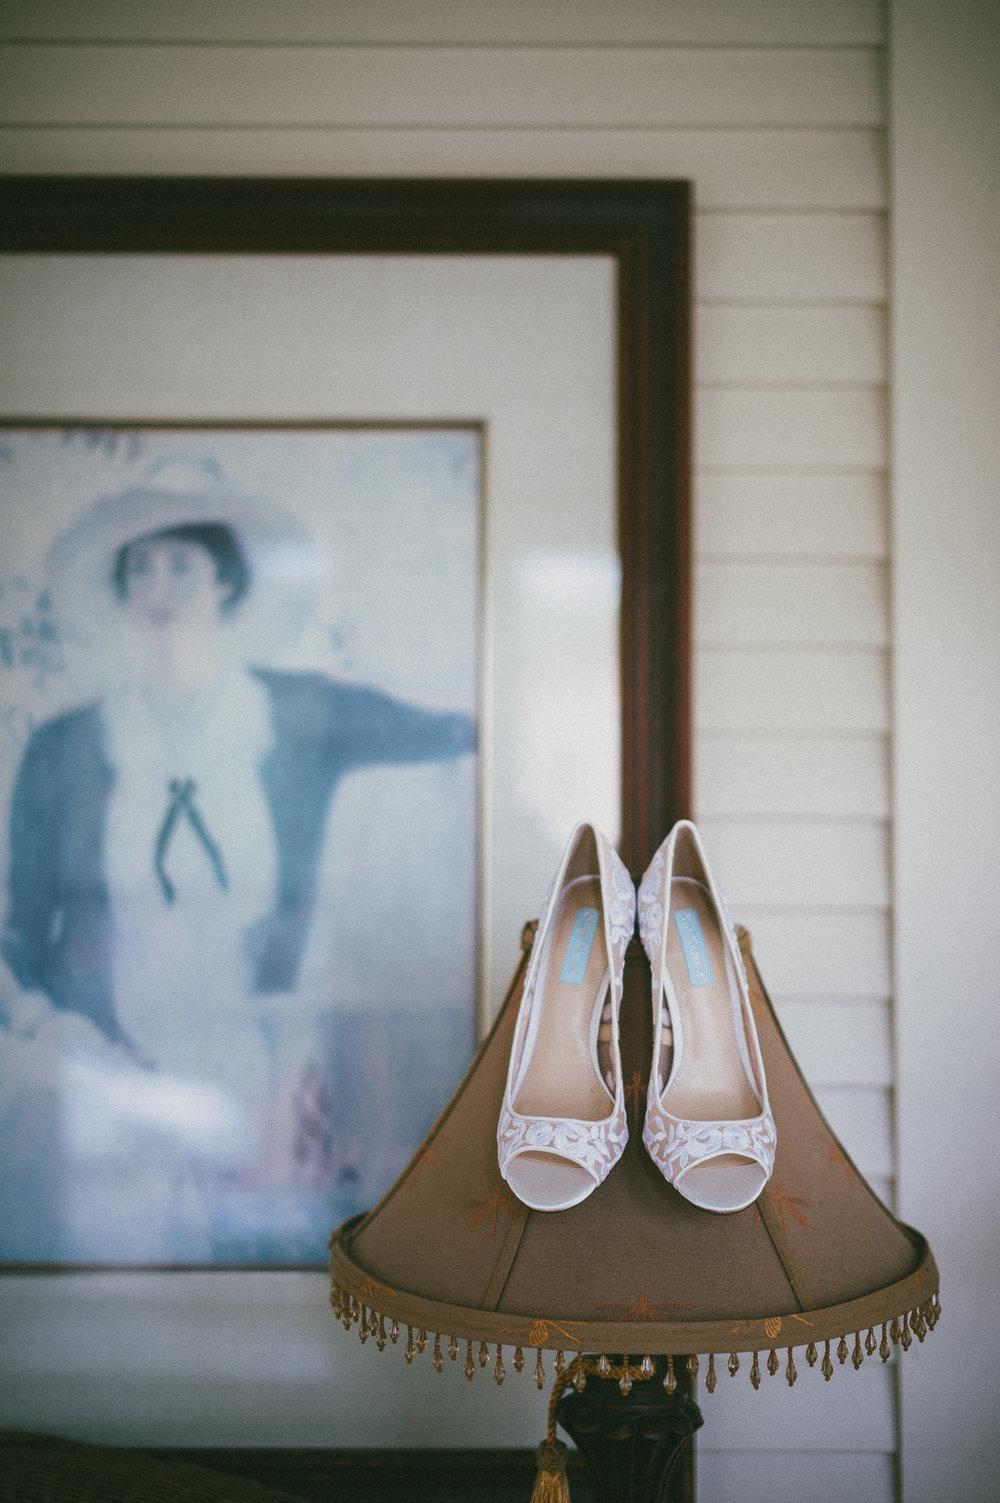 breighton-and-basette-photography-copyrighted-image-blog-amanda-and-eric-wedding-036.jpg